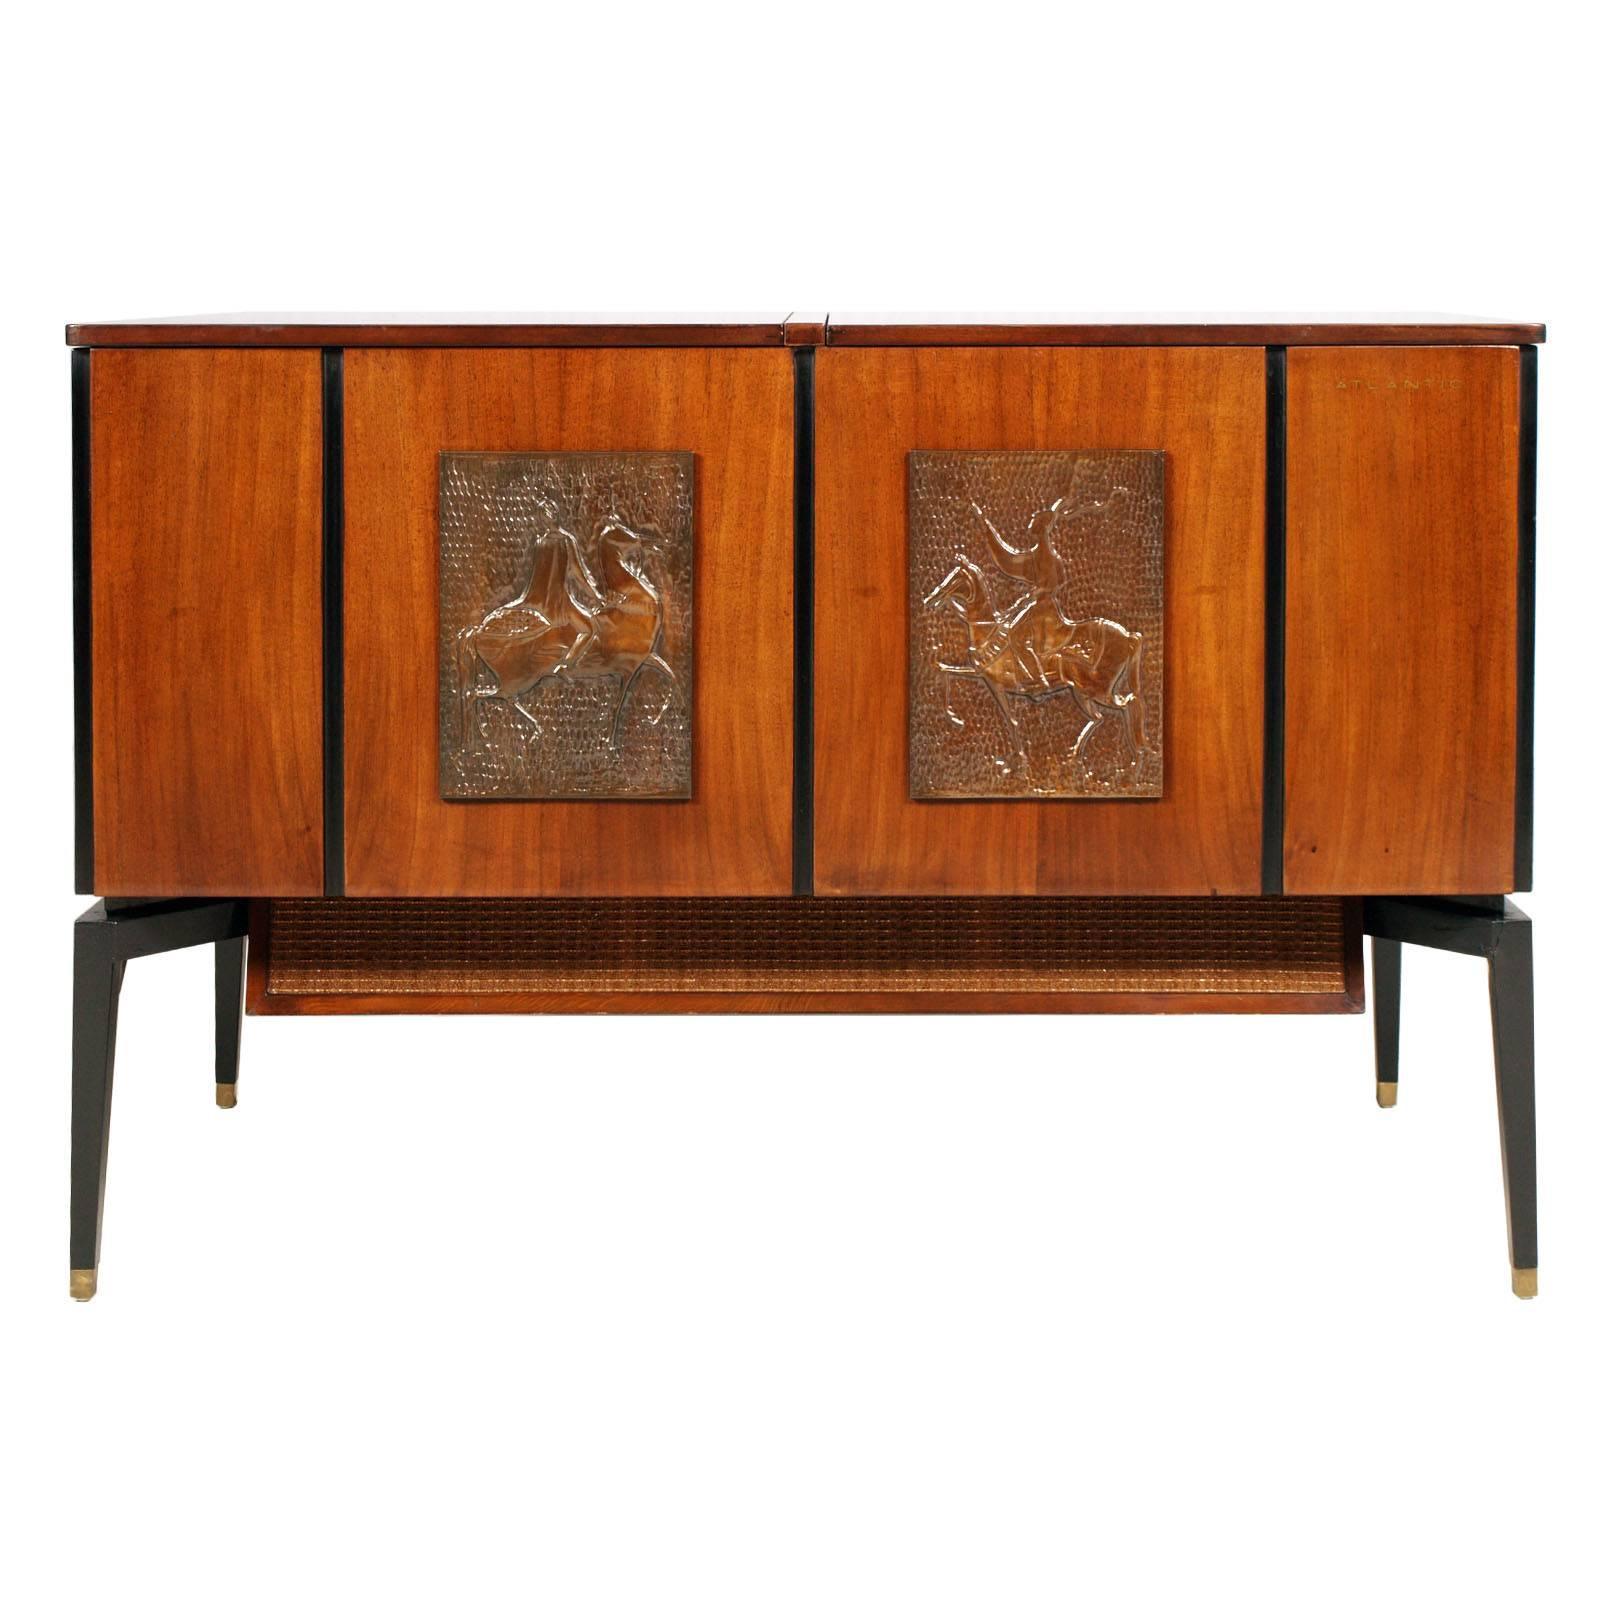 1960s Music Radio TV Record Player Cabinet in Mahogany Osvaldo Borsani Style